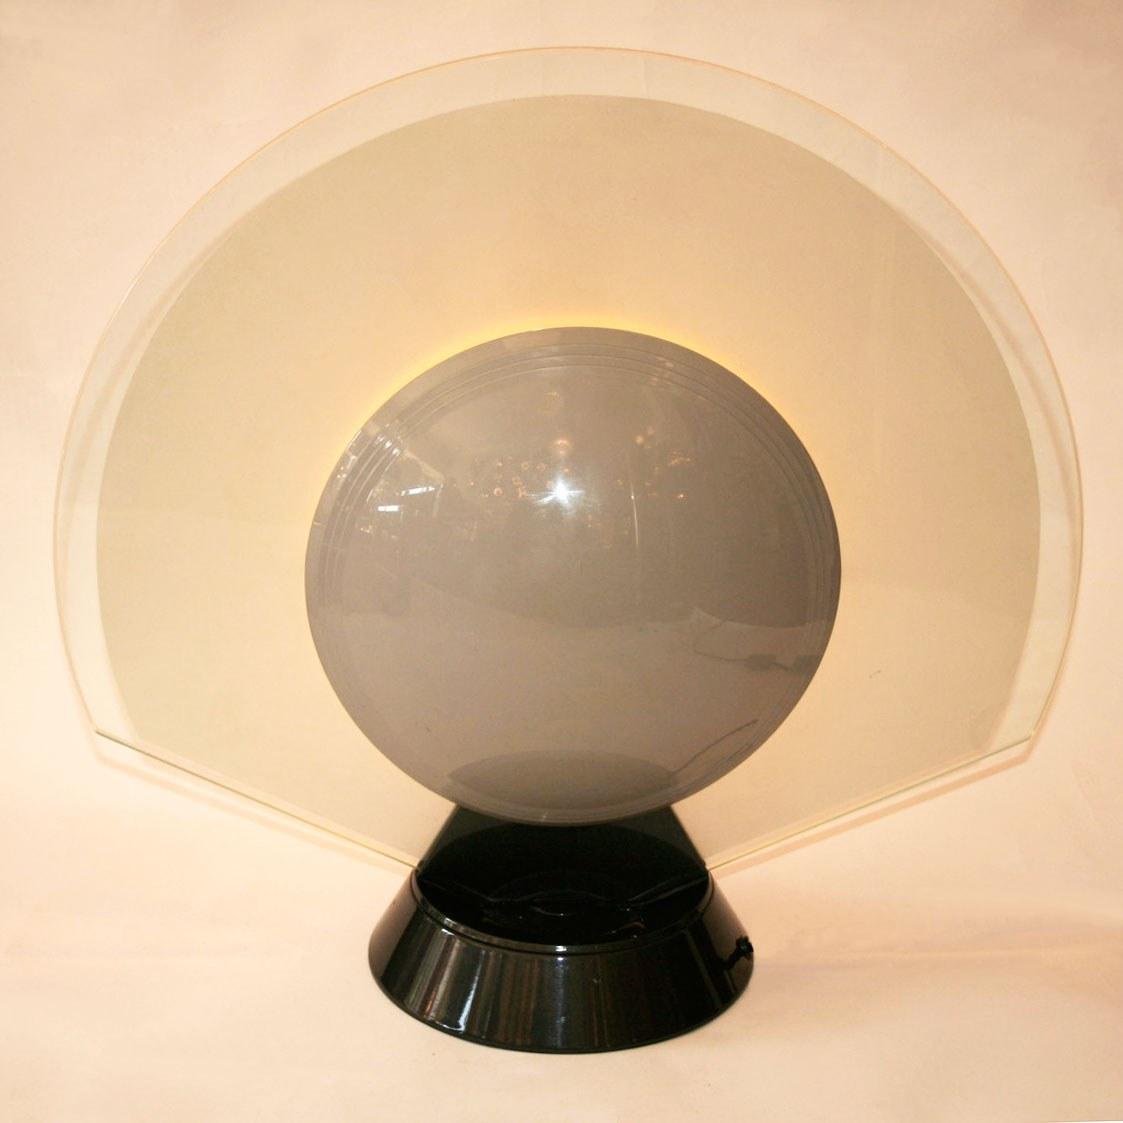 Valerie Wade Lt456 1950S Italian Sun Moon Lamp 02